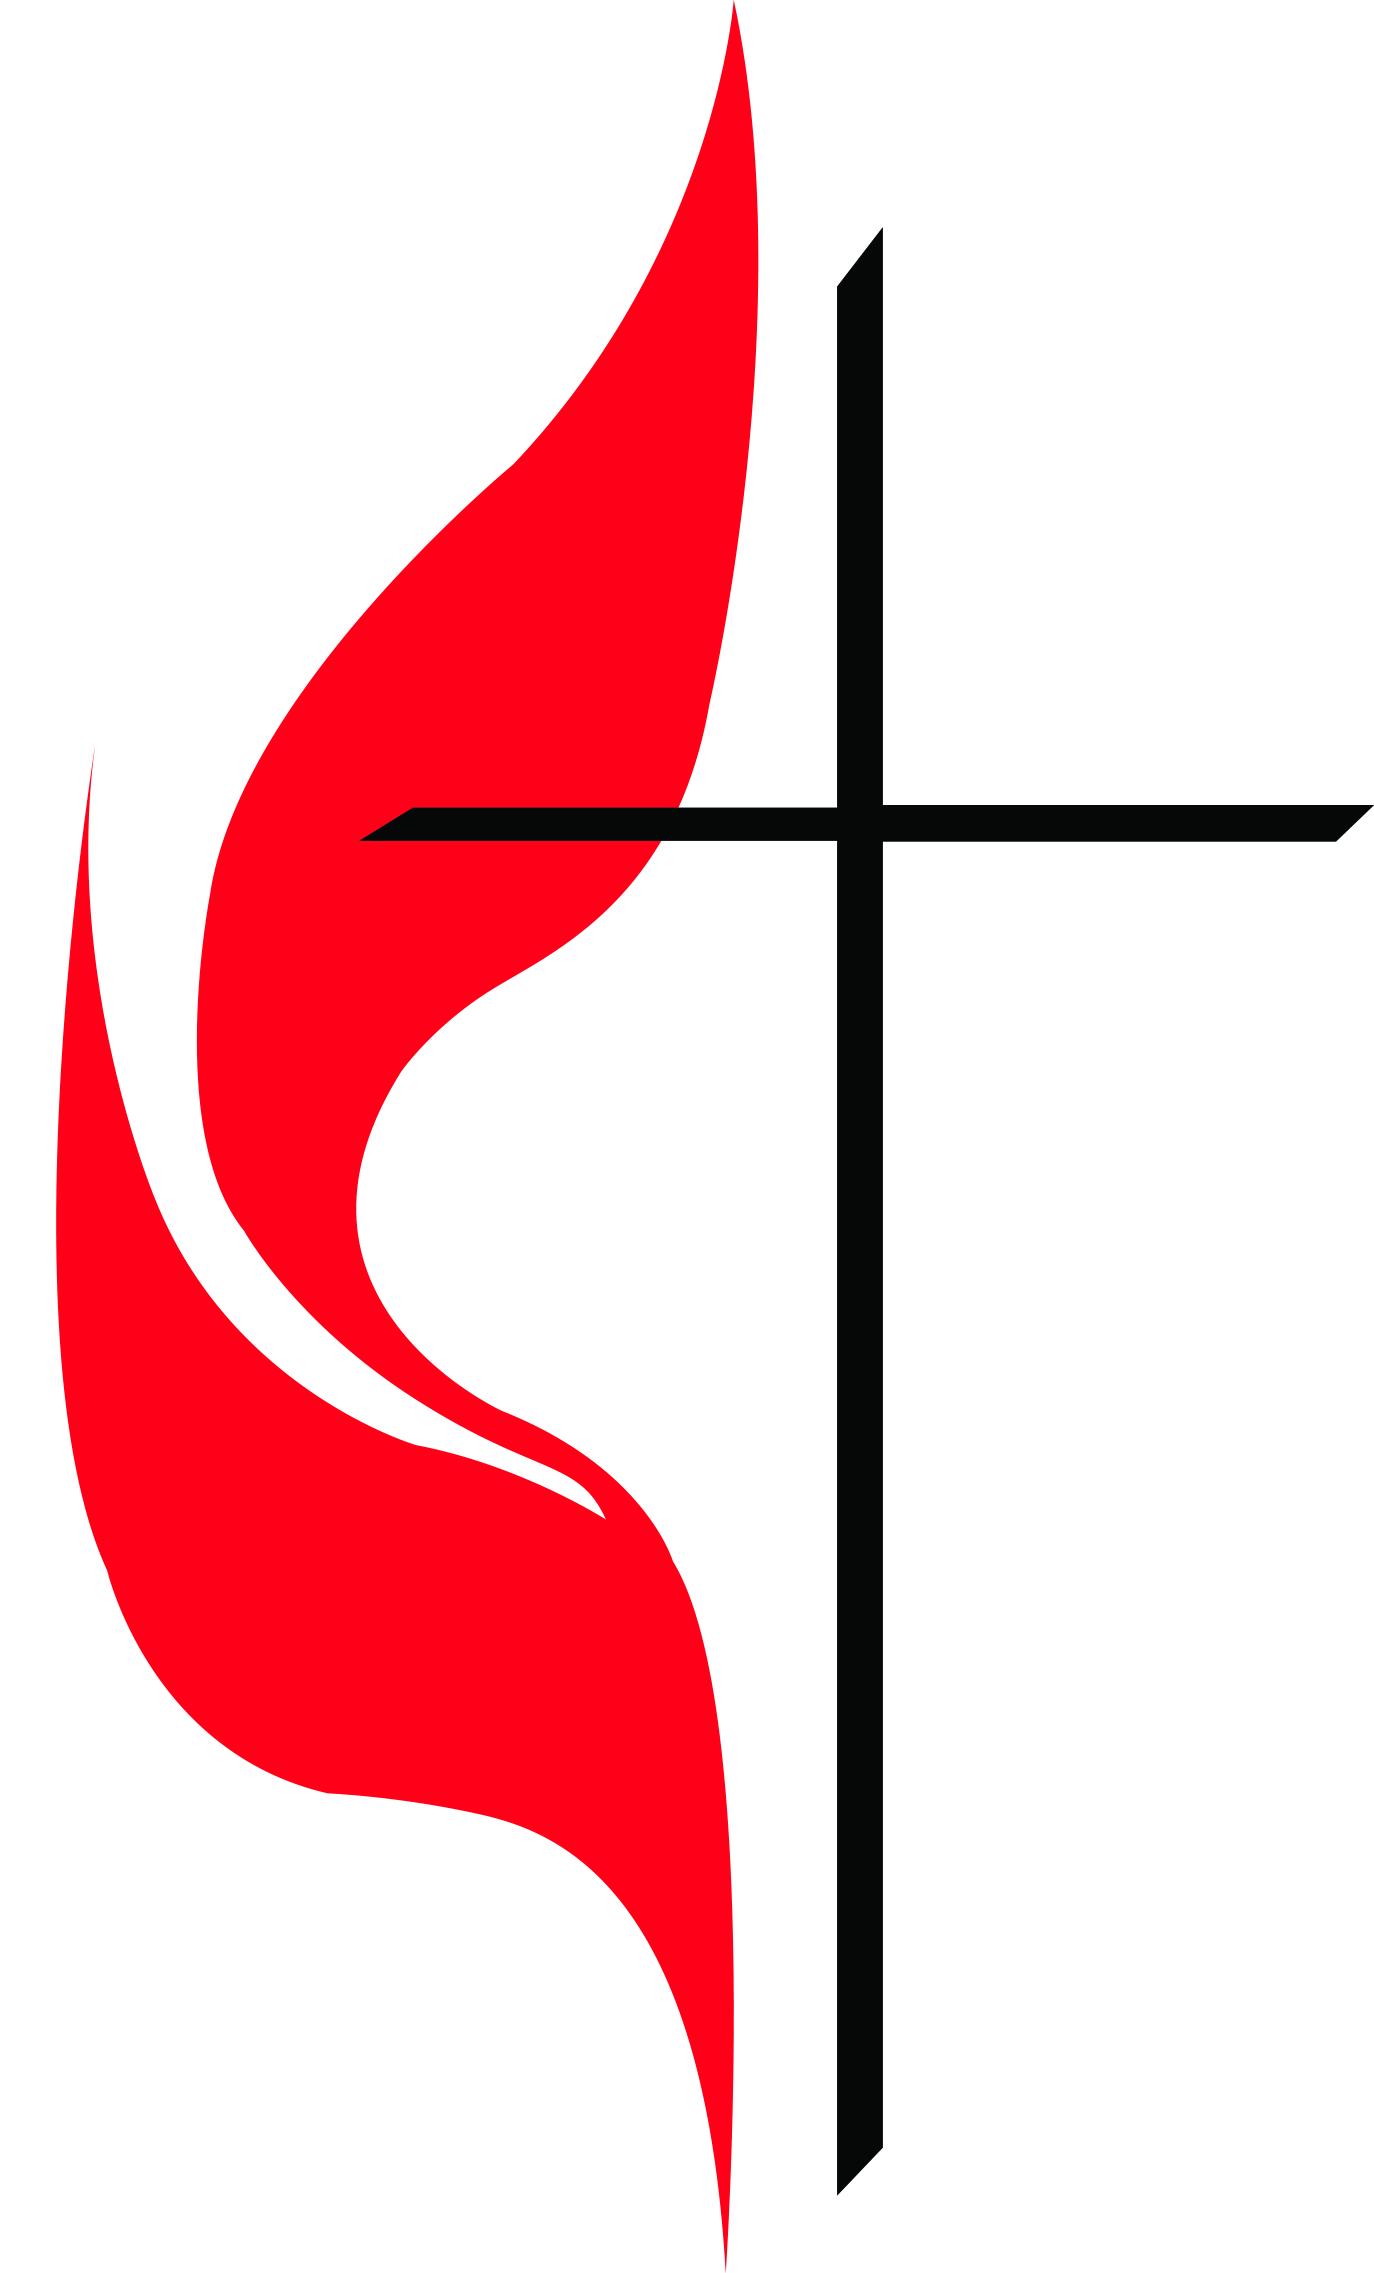 united methodist logos rh logolynx com methodist cross and flame clipart